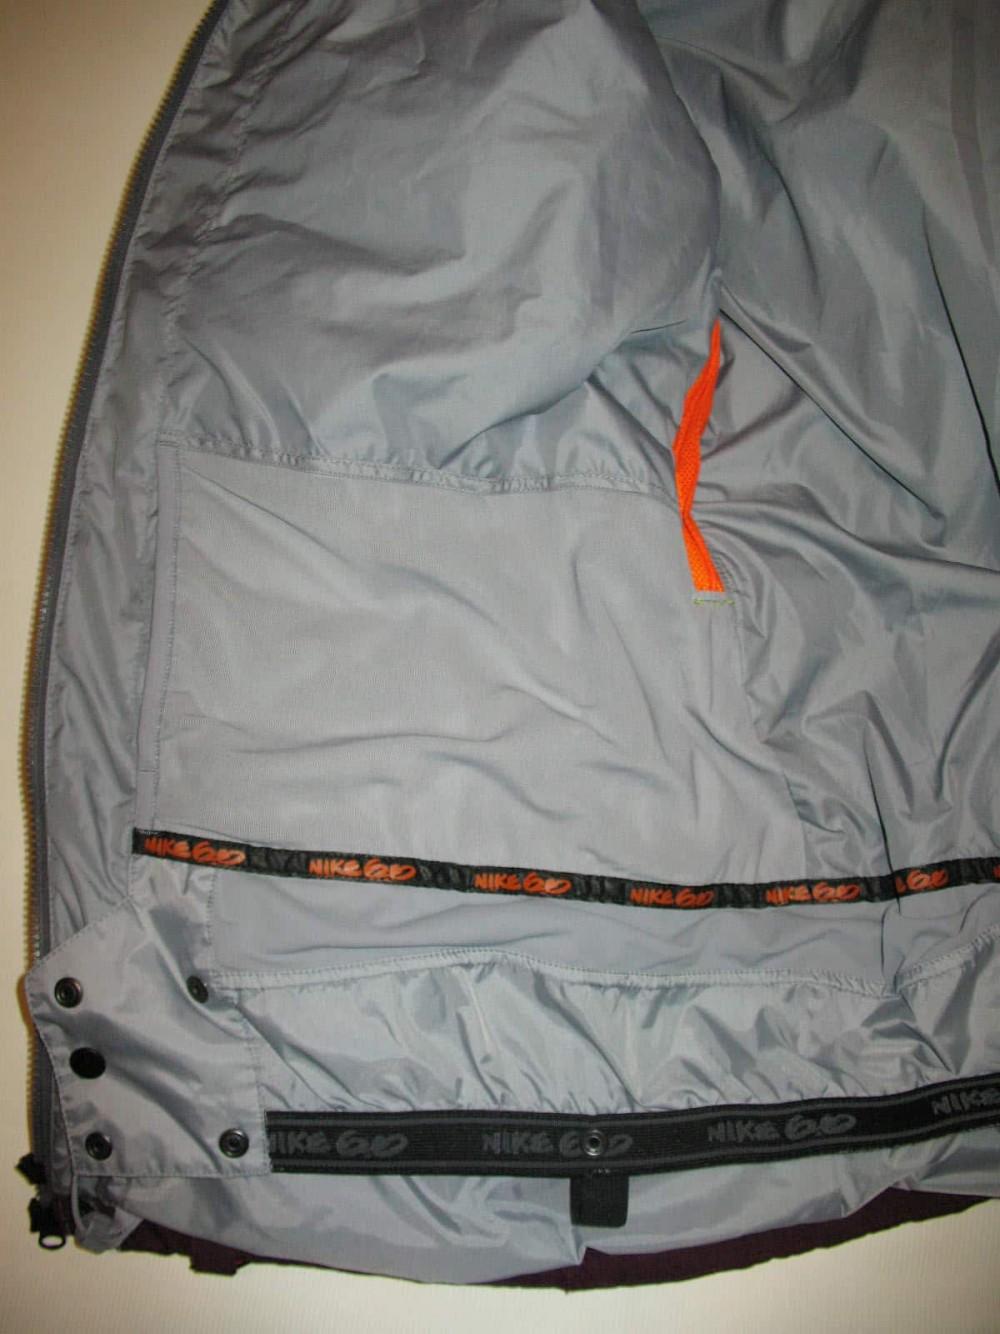 Куртка NIKE 6.0 down jacket (размер XXL/XXXL) - 12